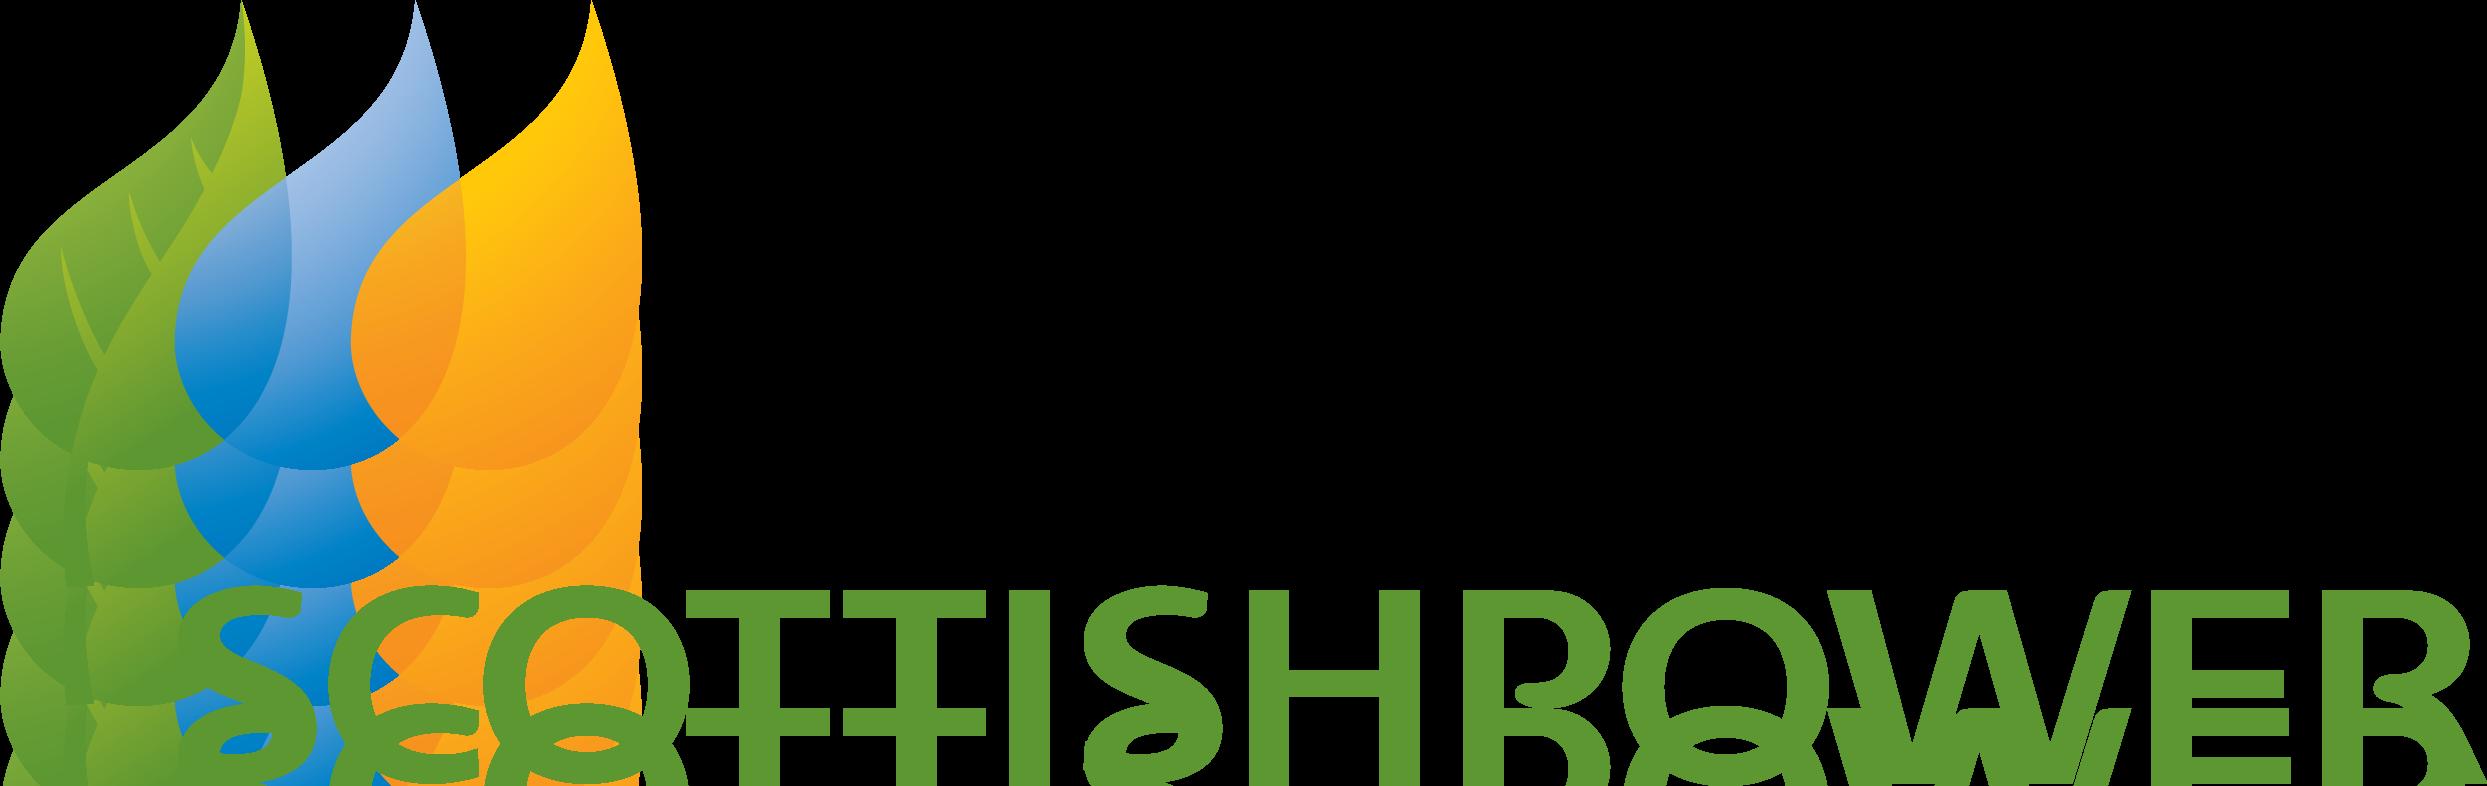 Scottish Power Logopedia The Logo And Branding Site